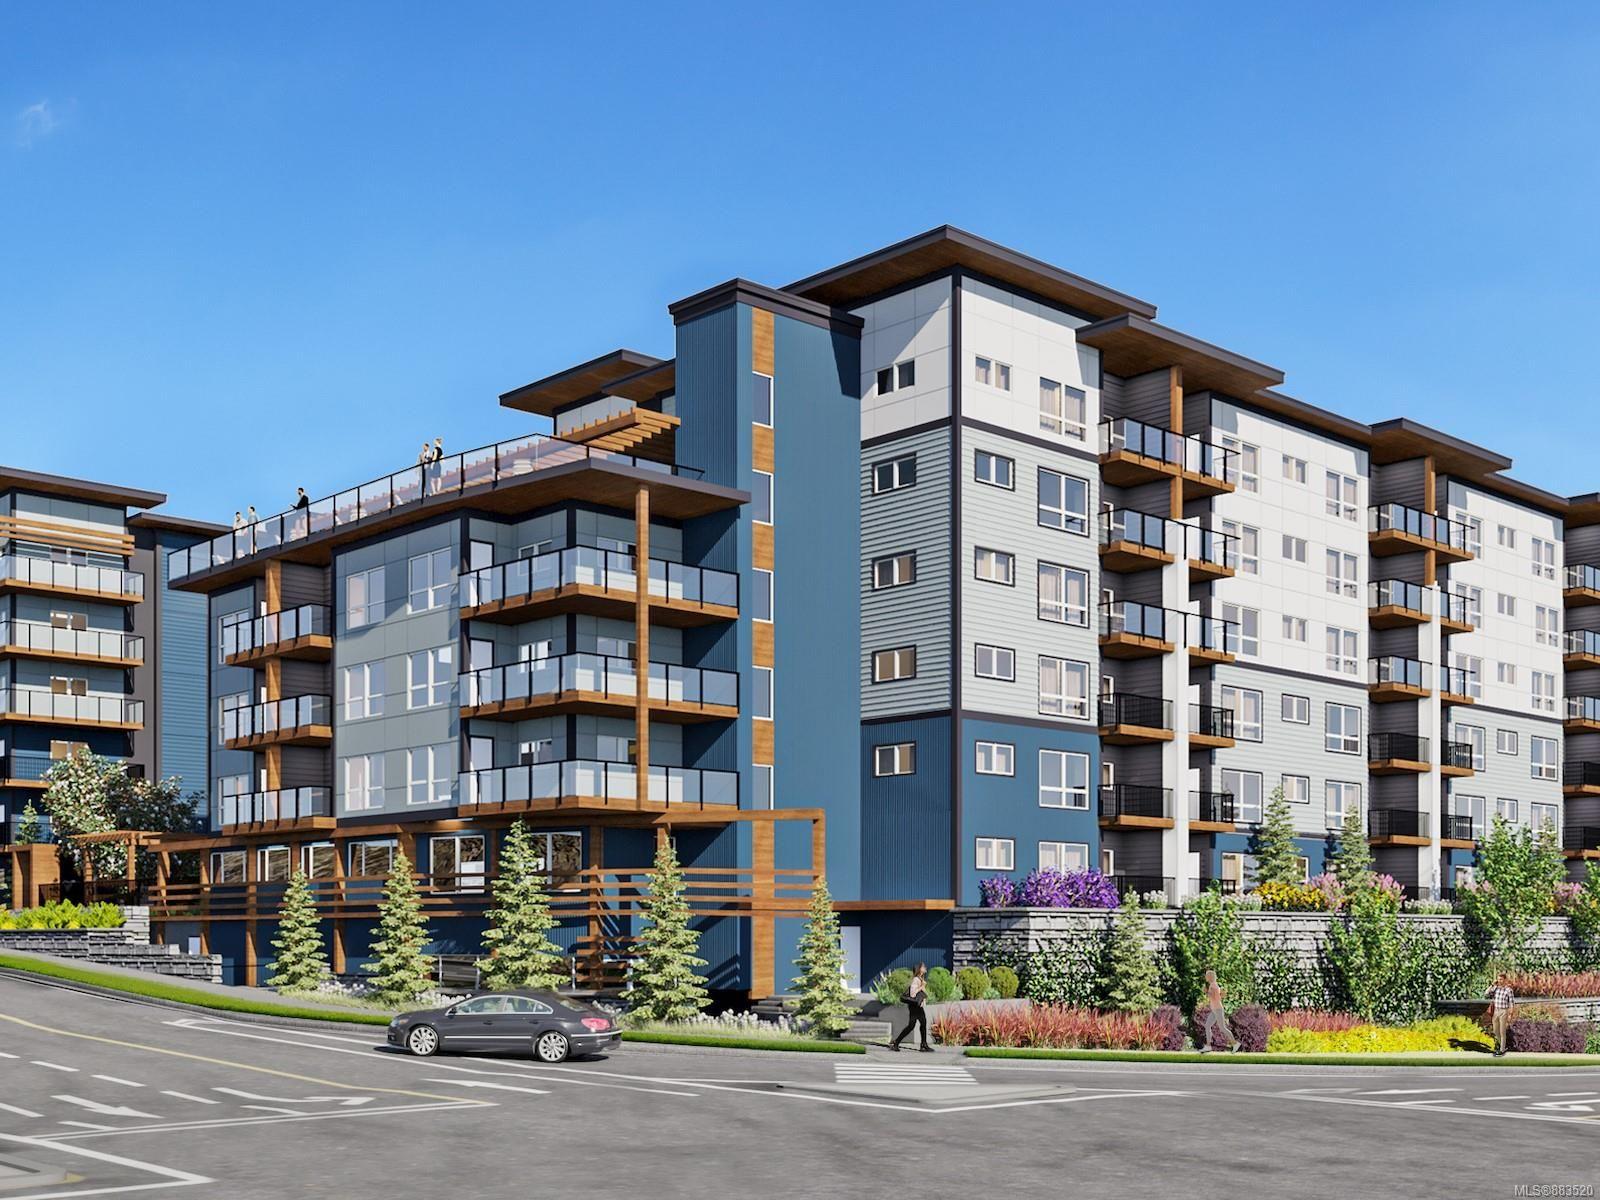 Main Photo: 217C 2469 Gateway Rd in : La Florence Lake Condo for sale (Langford)  : MLS®# 883520